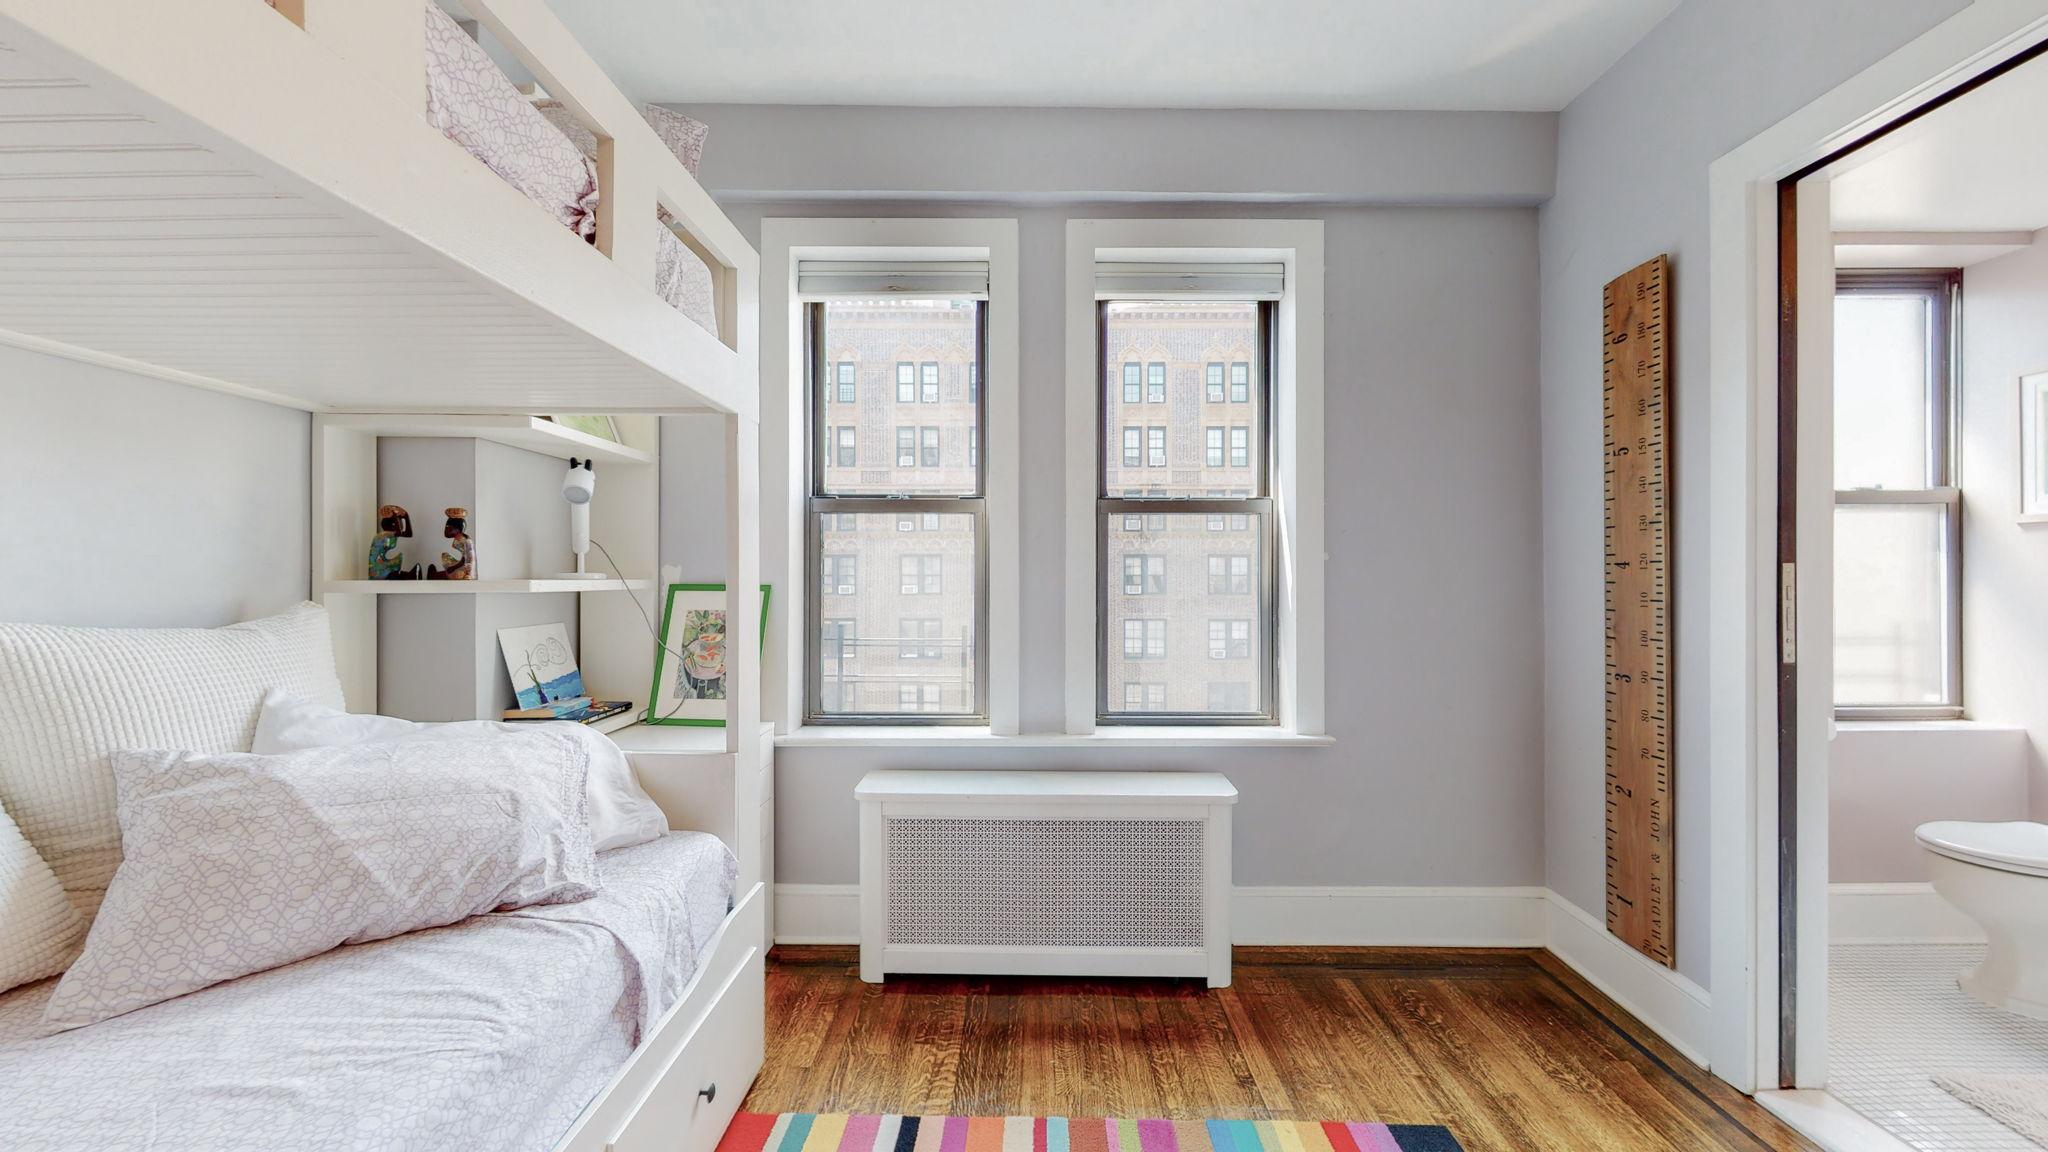 49 West 72nd Street, New York, New York, New York, United States 10023, 2 Bedrooms Bedrooms, ,2 BathroomsBathrooms,Co-op,Off Market,West 72nd Street,1135